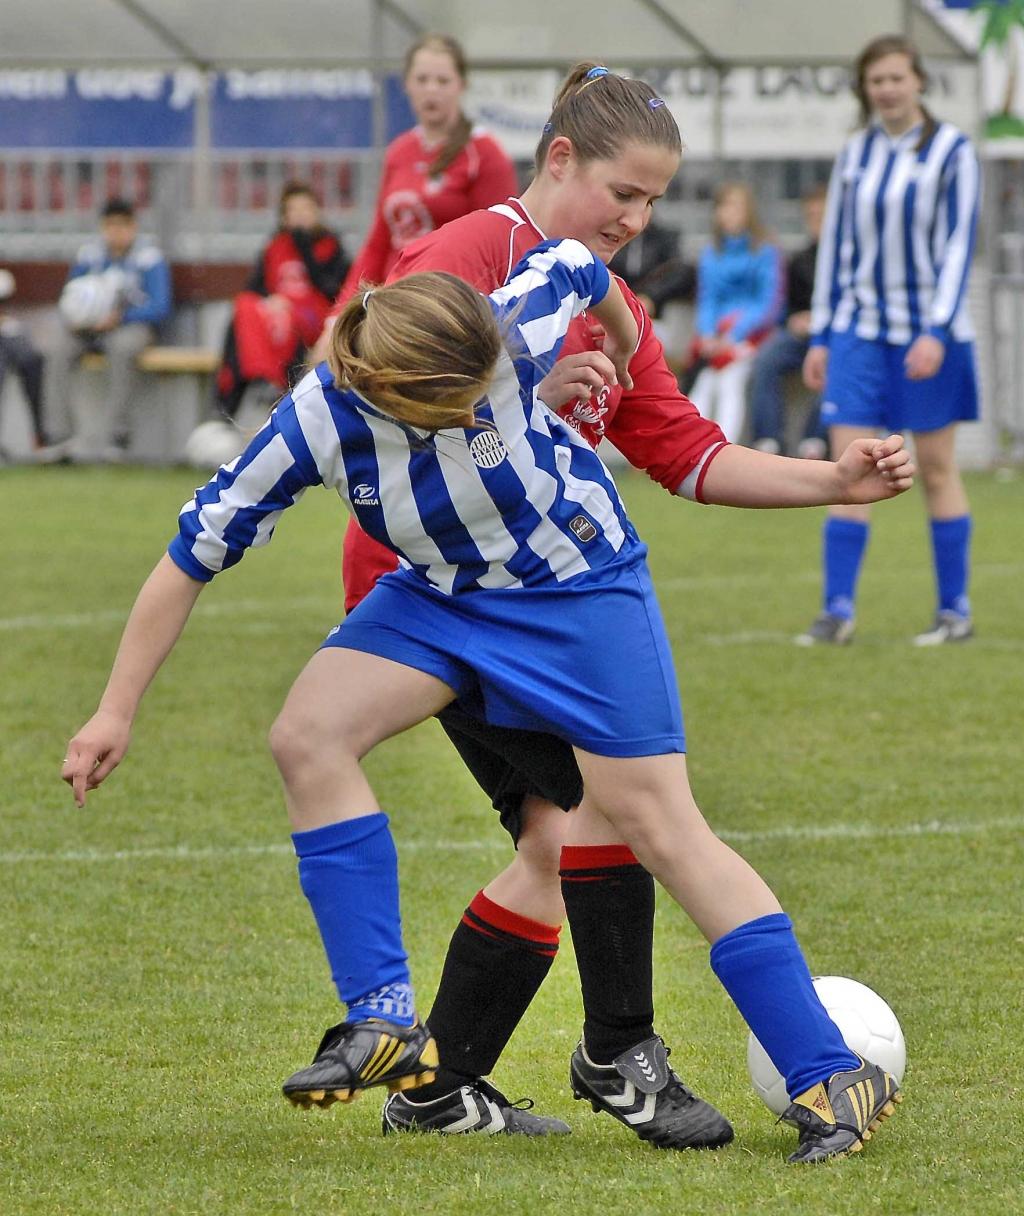 Vrouwenvoetbal is dankzij het Nederlands vrouwenvoetbal sterk in opkomst